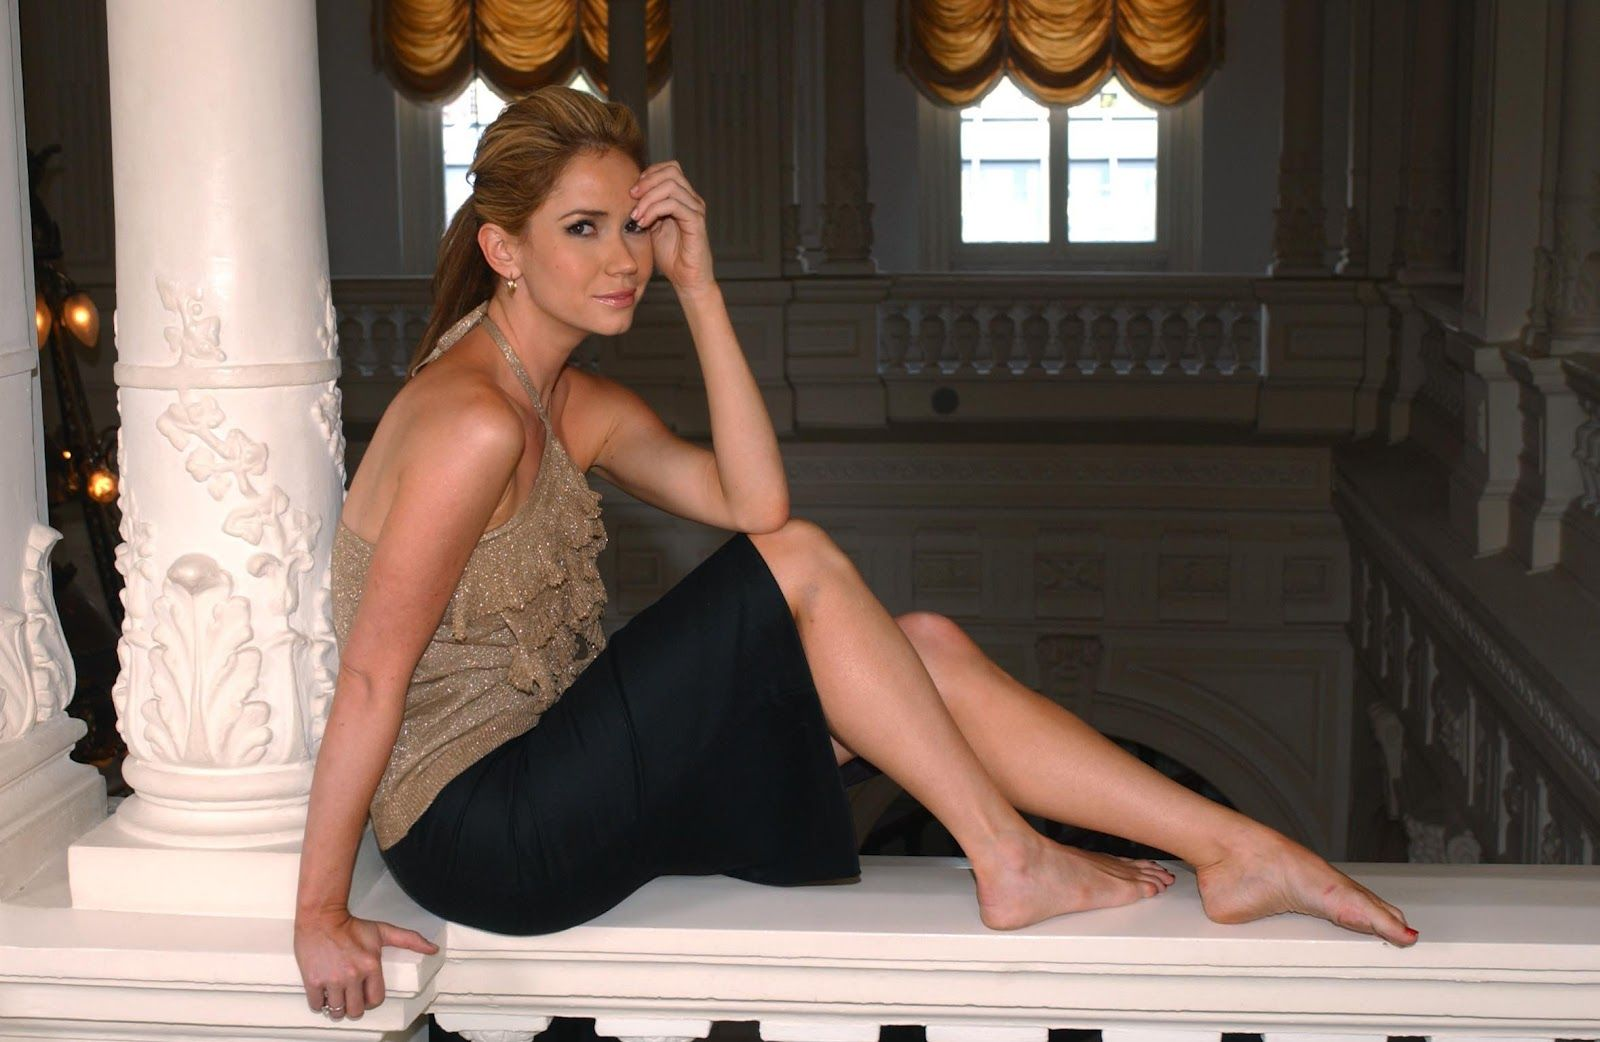 Feet Ashley Jones nude photos 2019